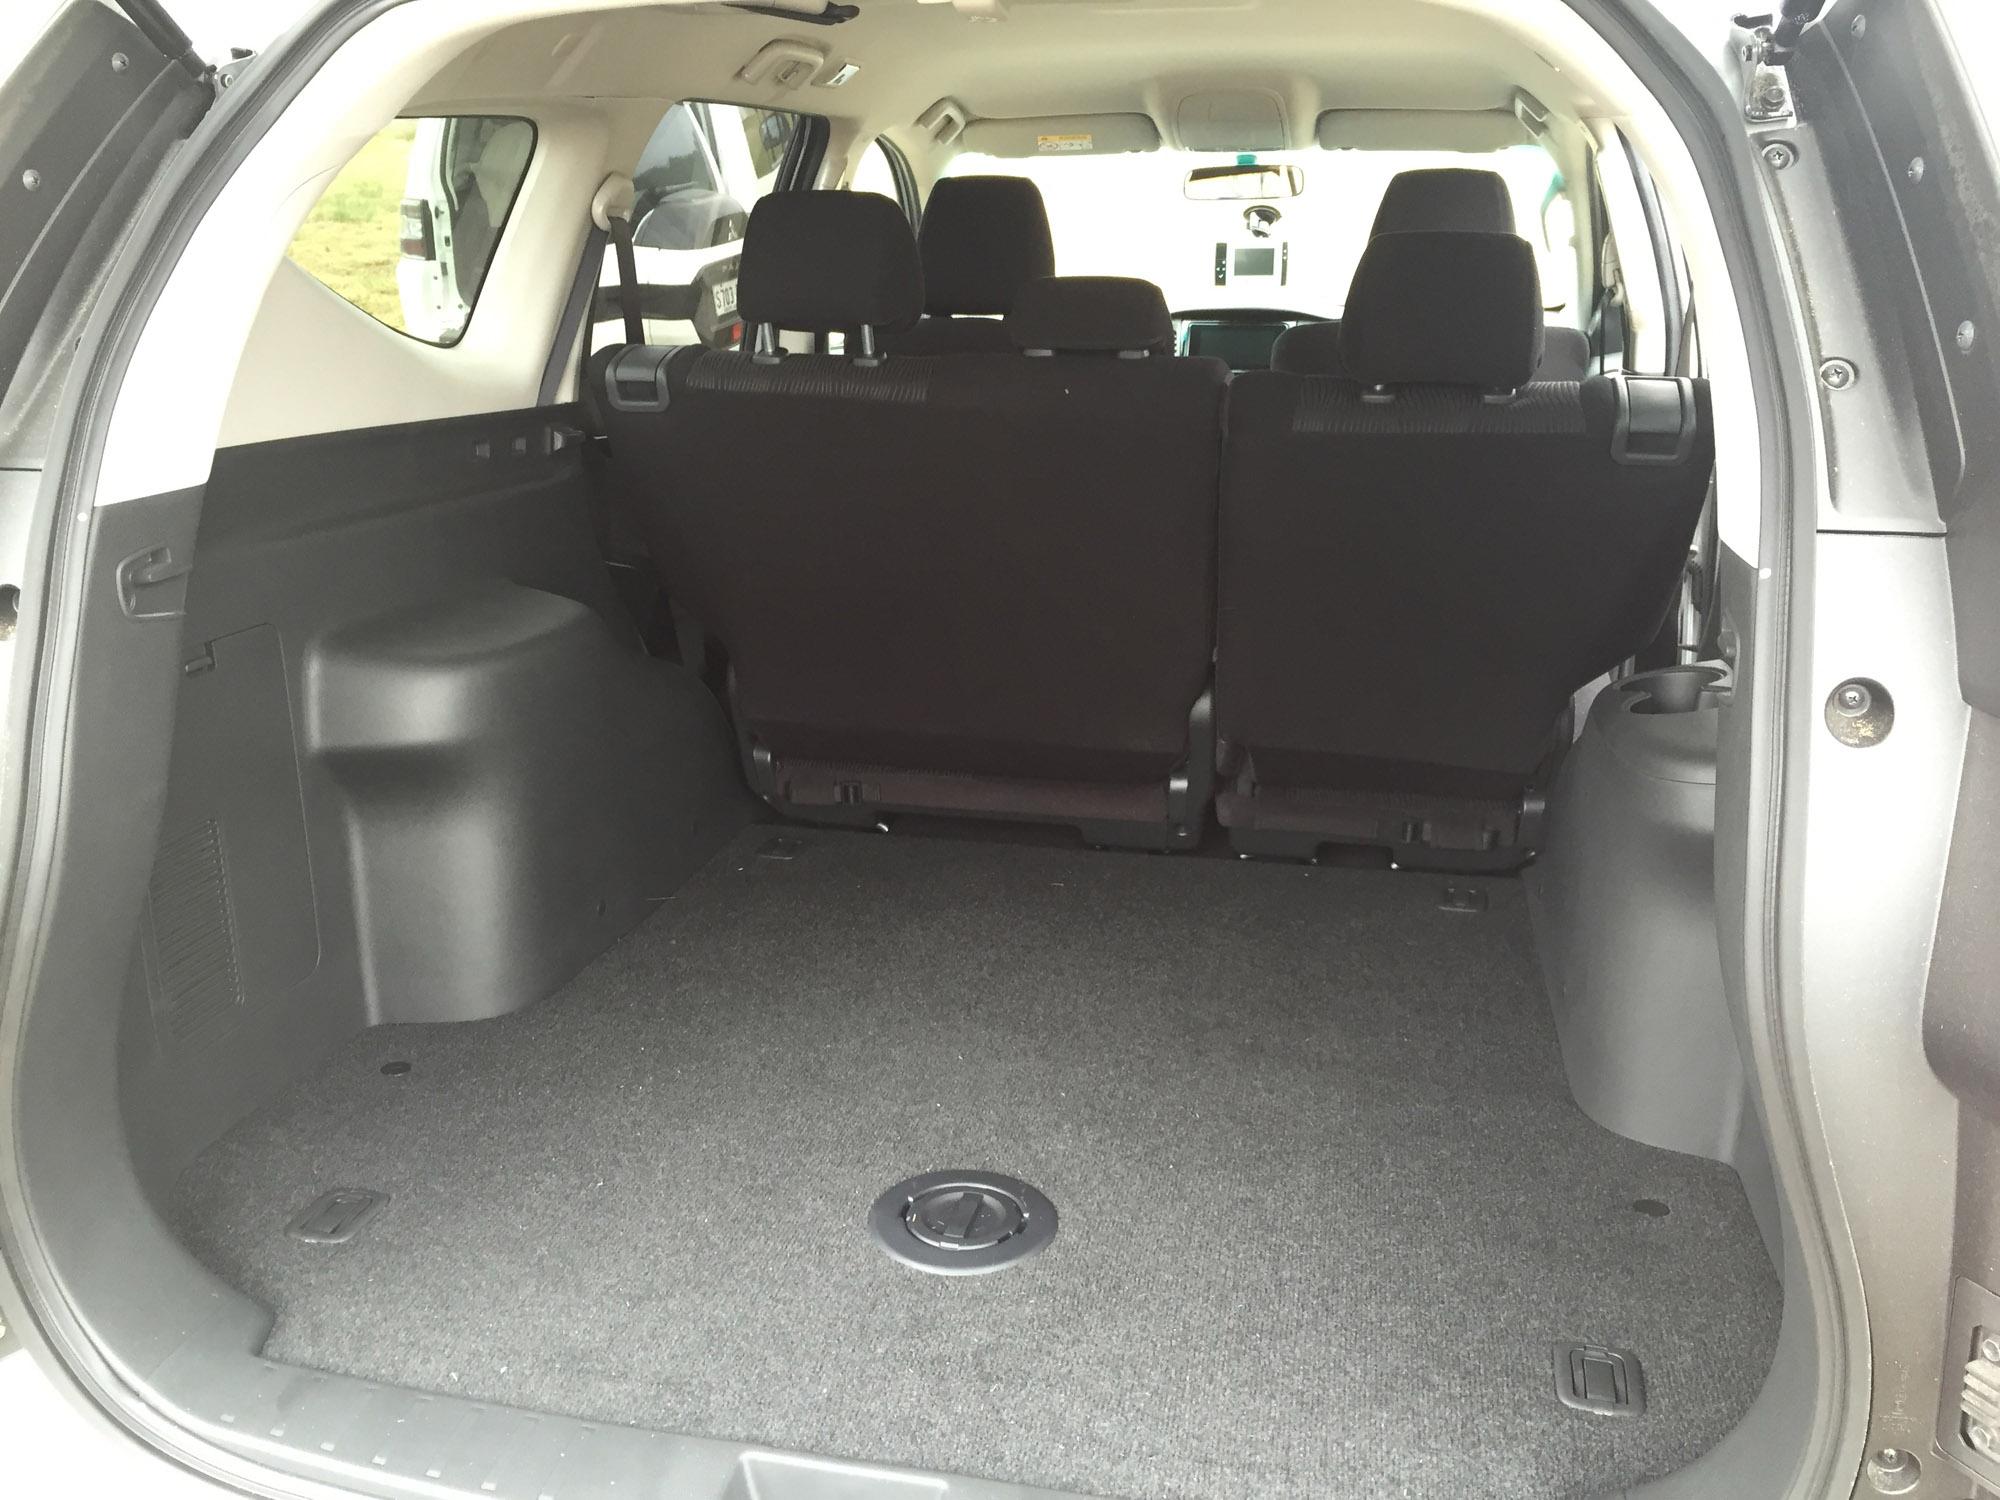 2016 Mitsubishi Pajero Sport Trunk Space